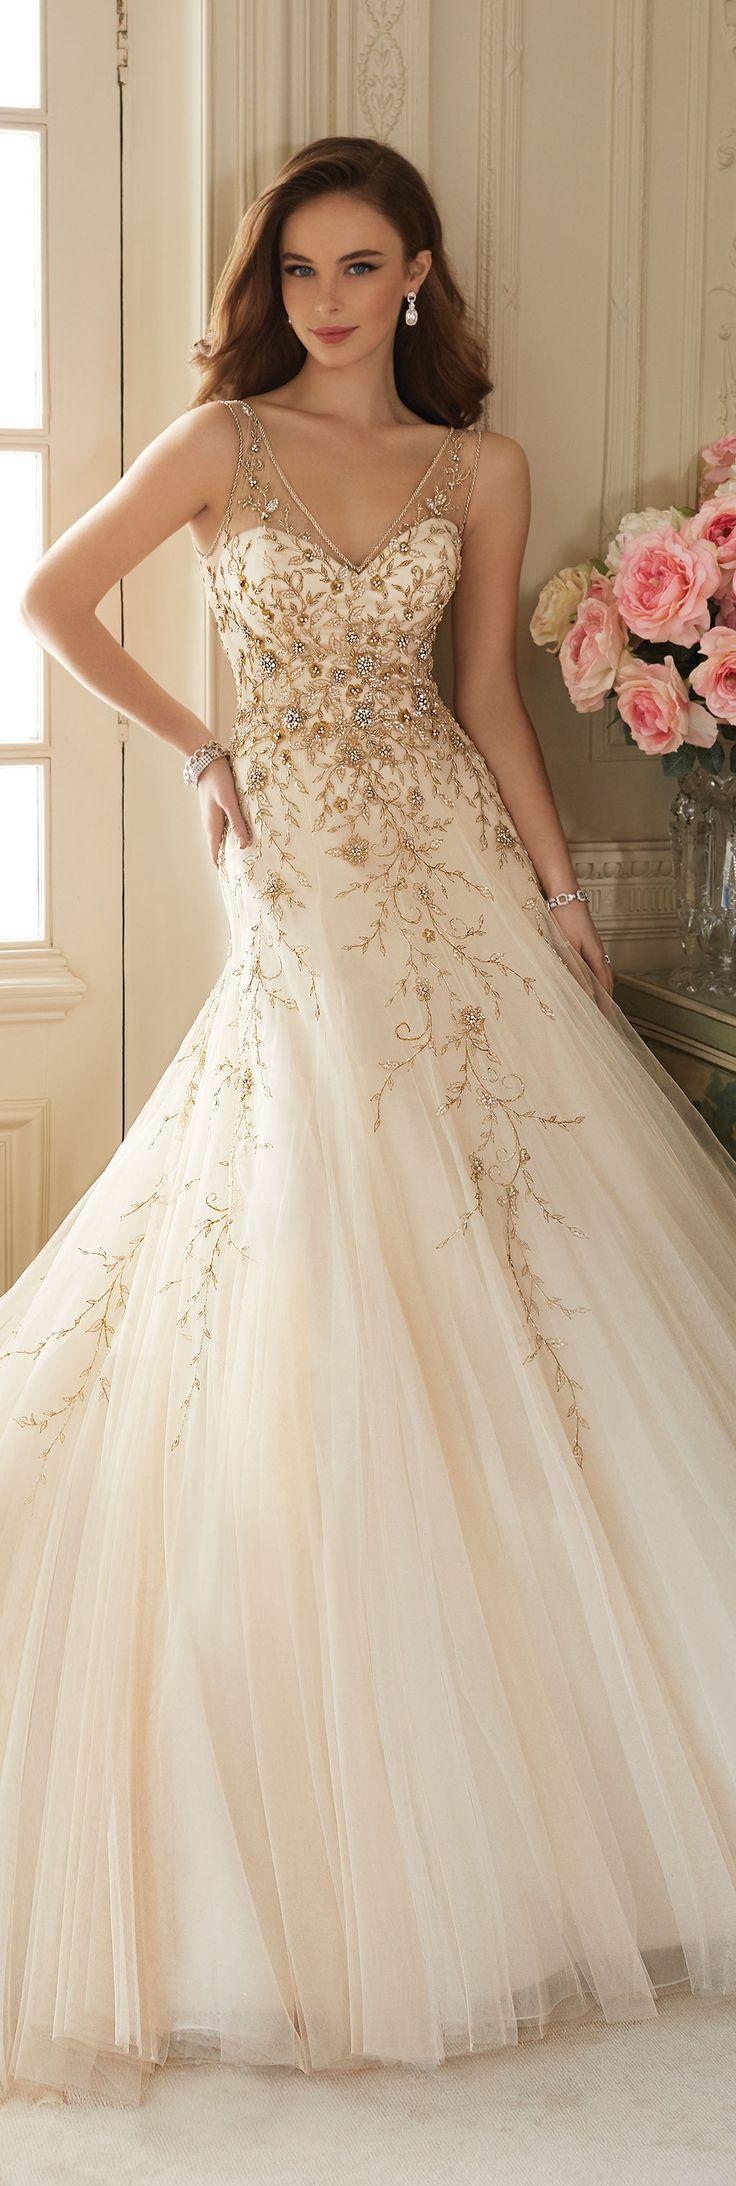 Cheap rustic wedding dresses   best Wedding Dresses  Photography ideas images on Pinterest